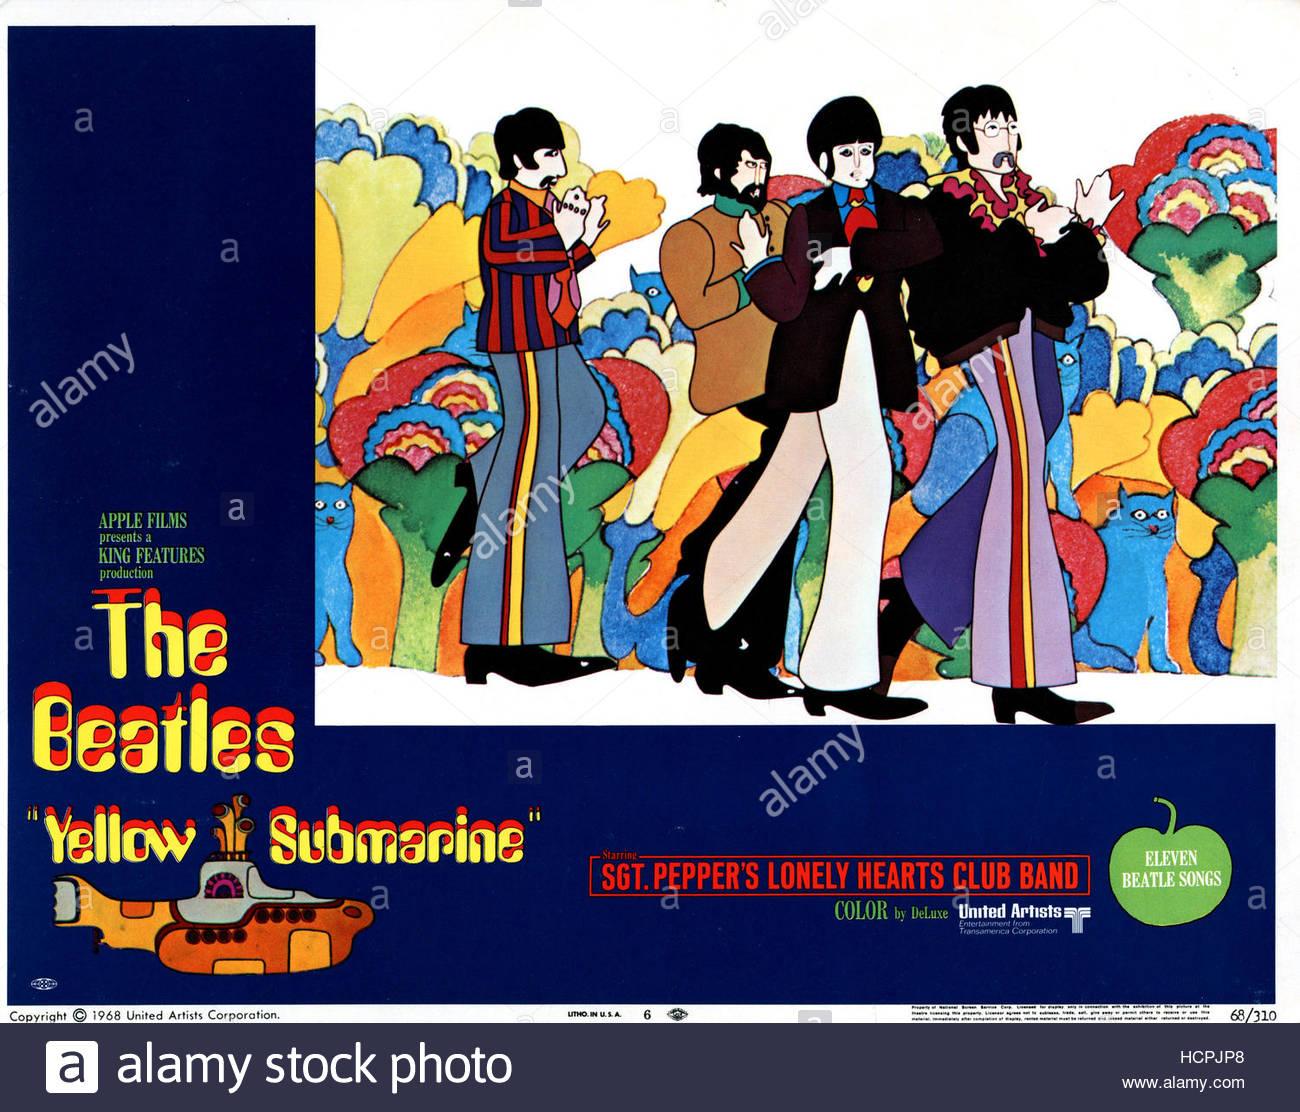 YELLOW SUBMARINE, The Beatles, US poster, from left:Ringo Starr, George Harrison, Paul McCartney, John Lennon, 1968. Stock Photo